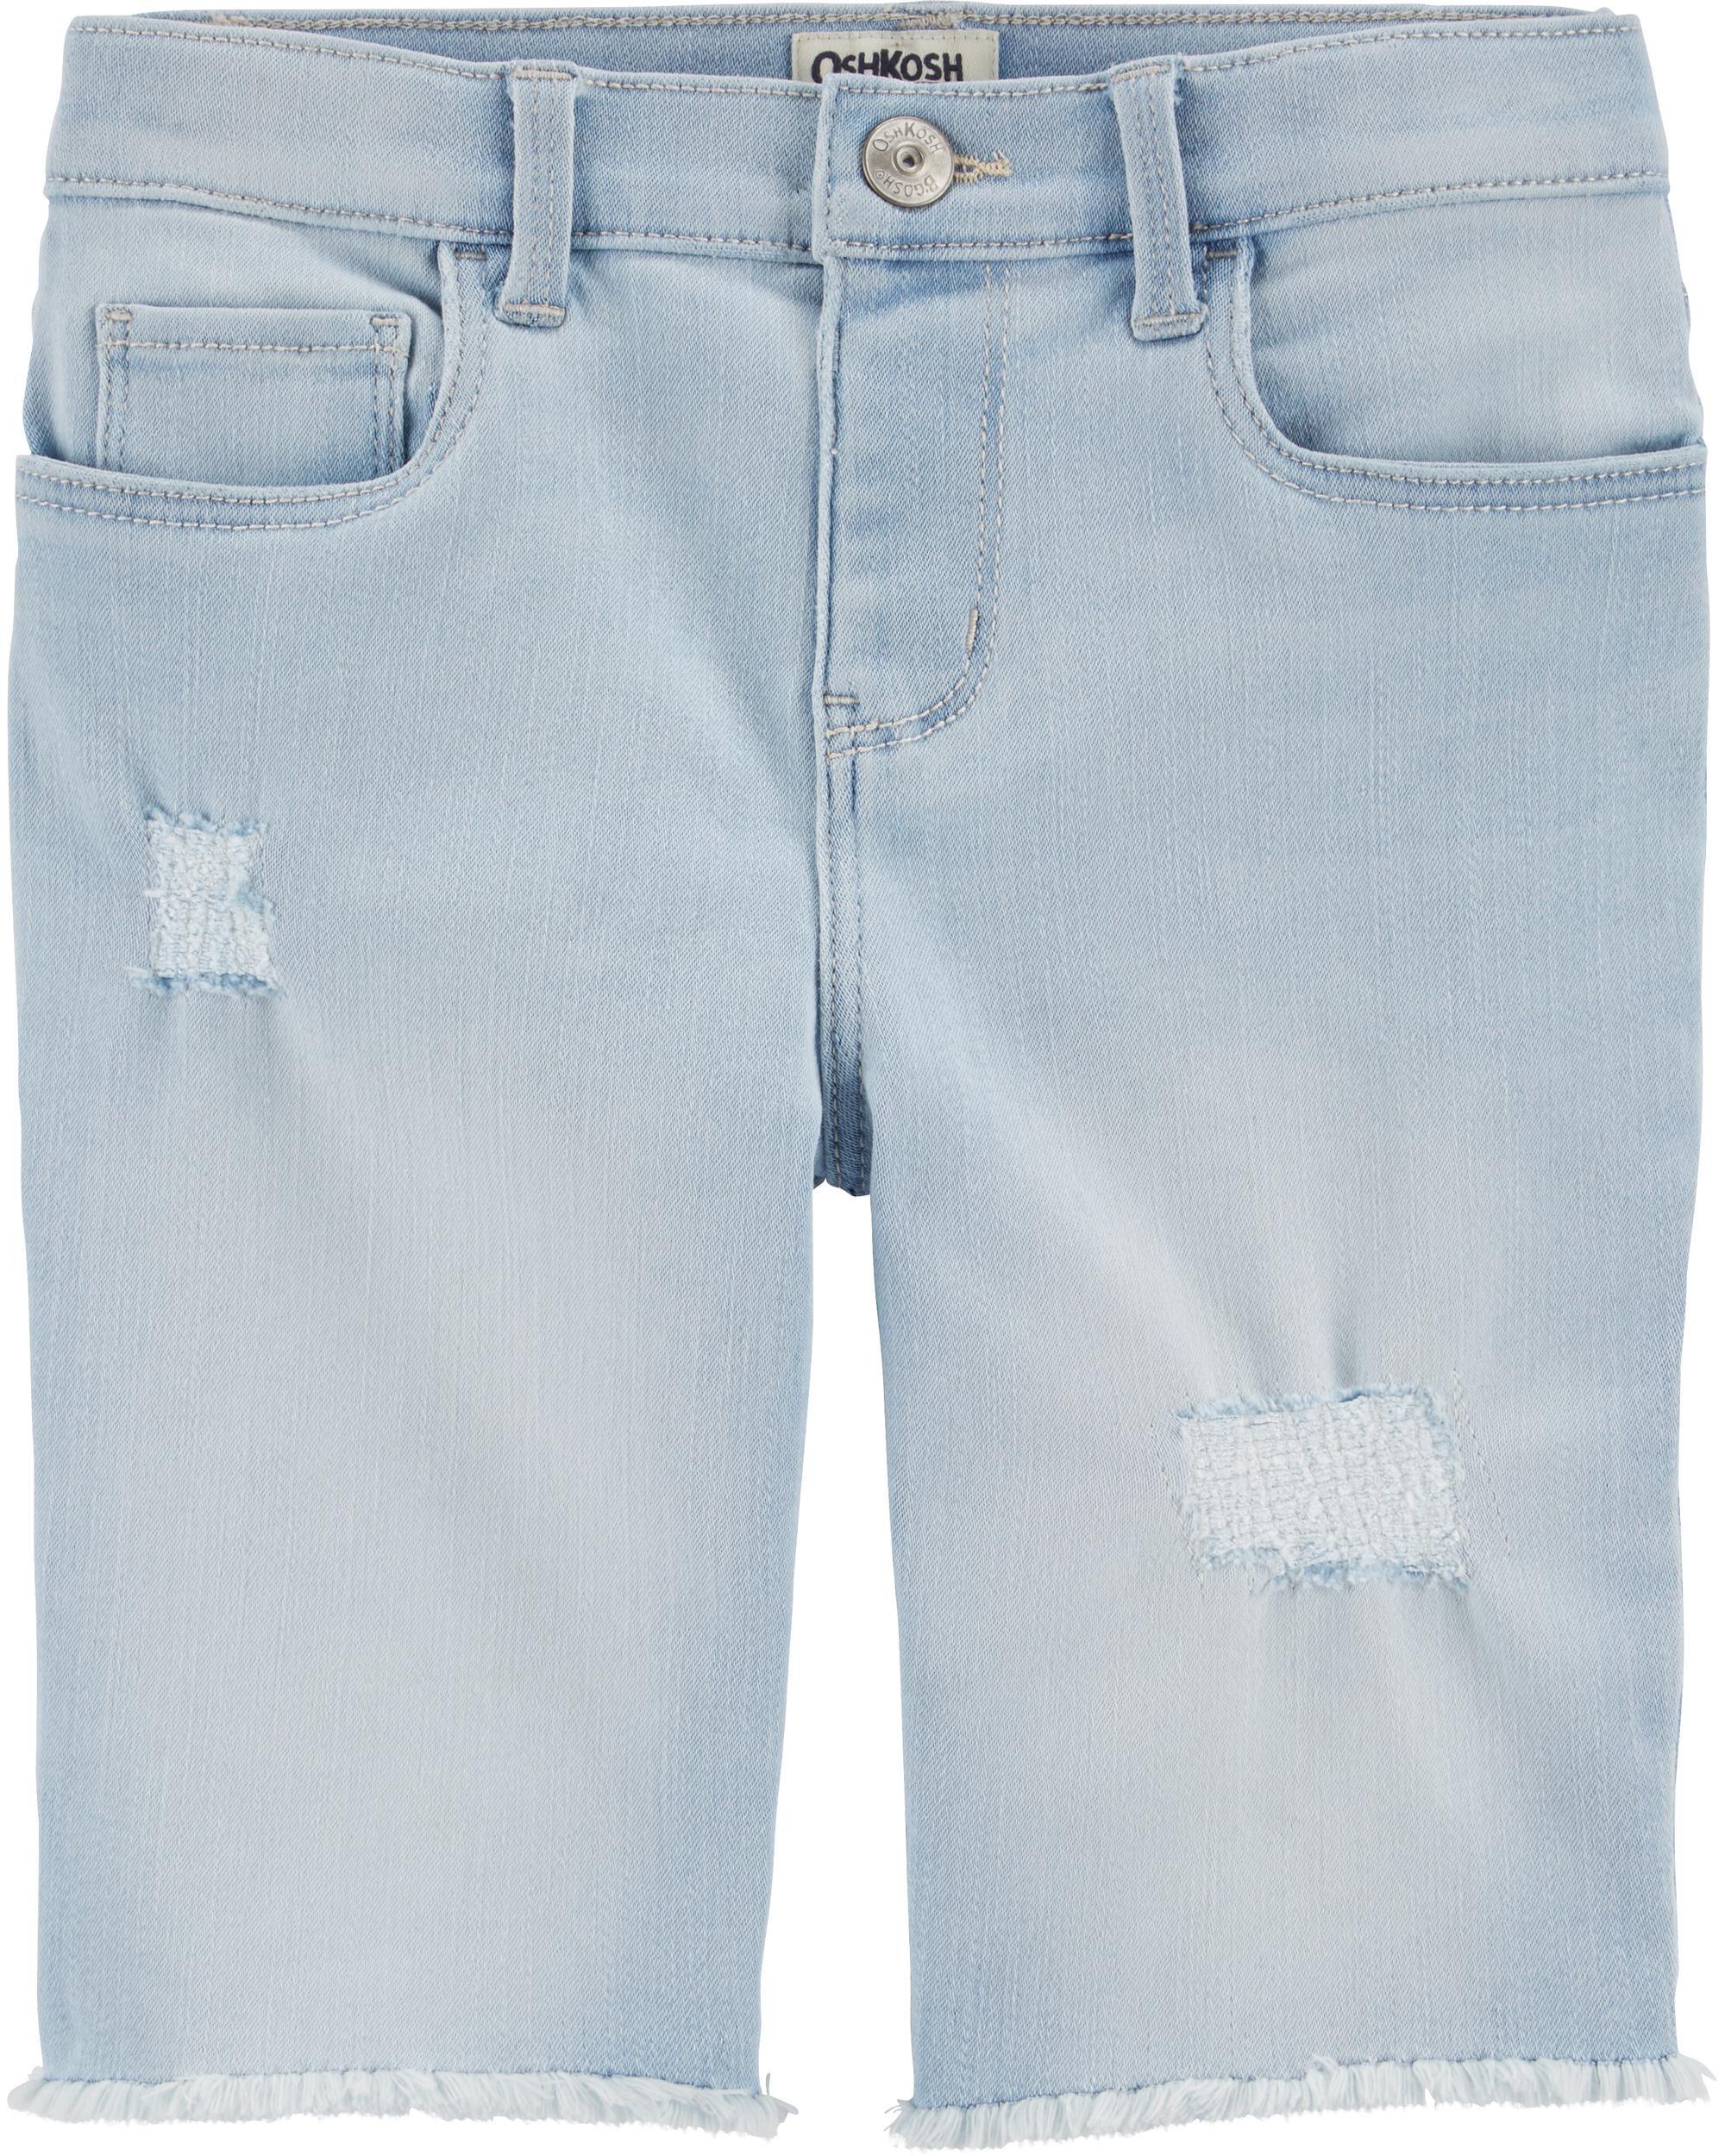 *Clearance*  Rip and Repair Denim Skimmer Shorts